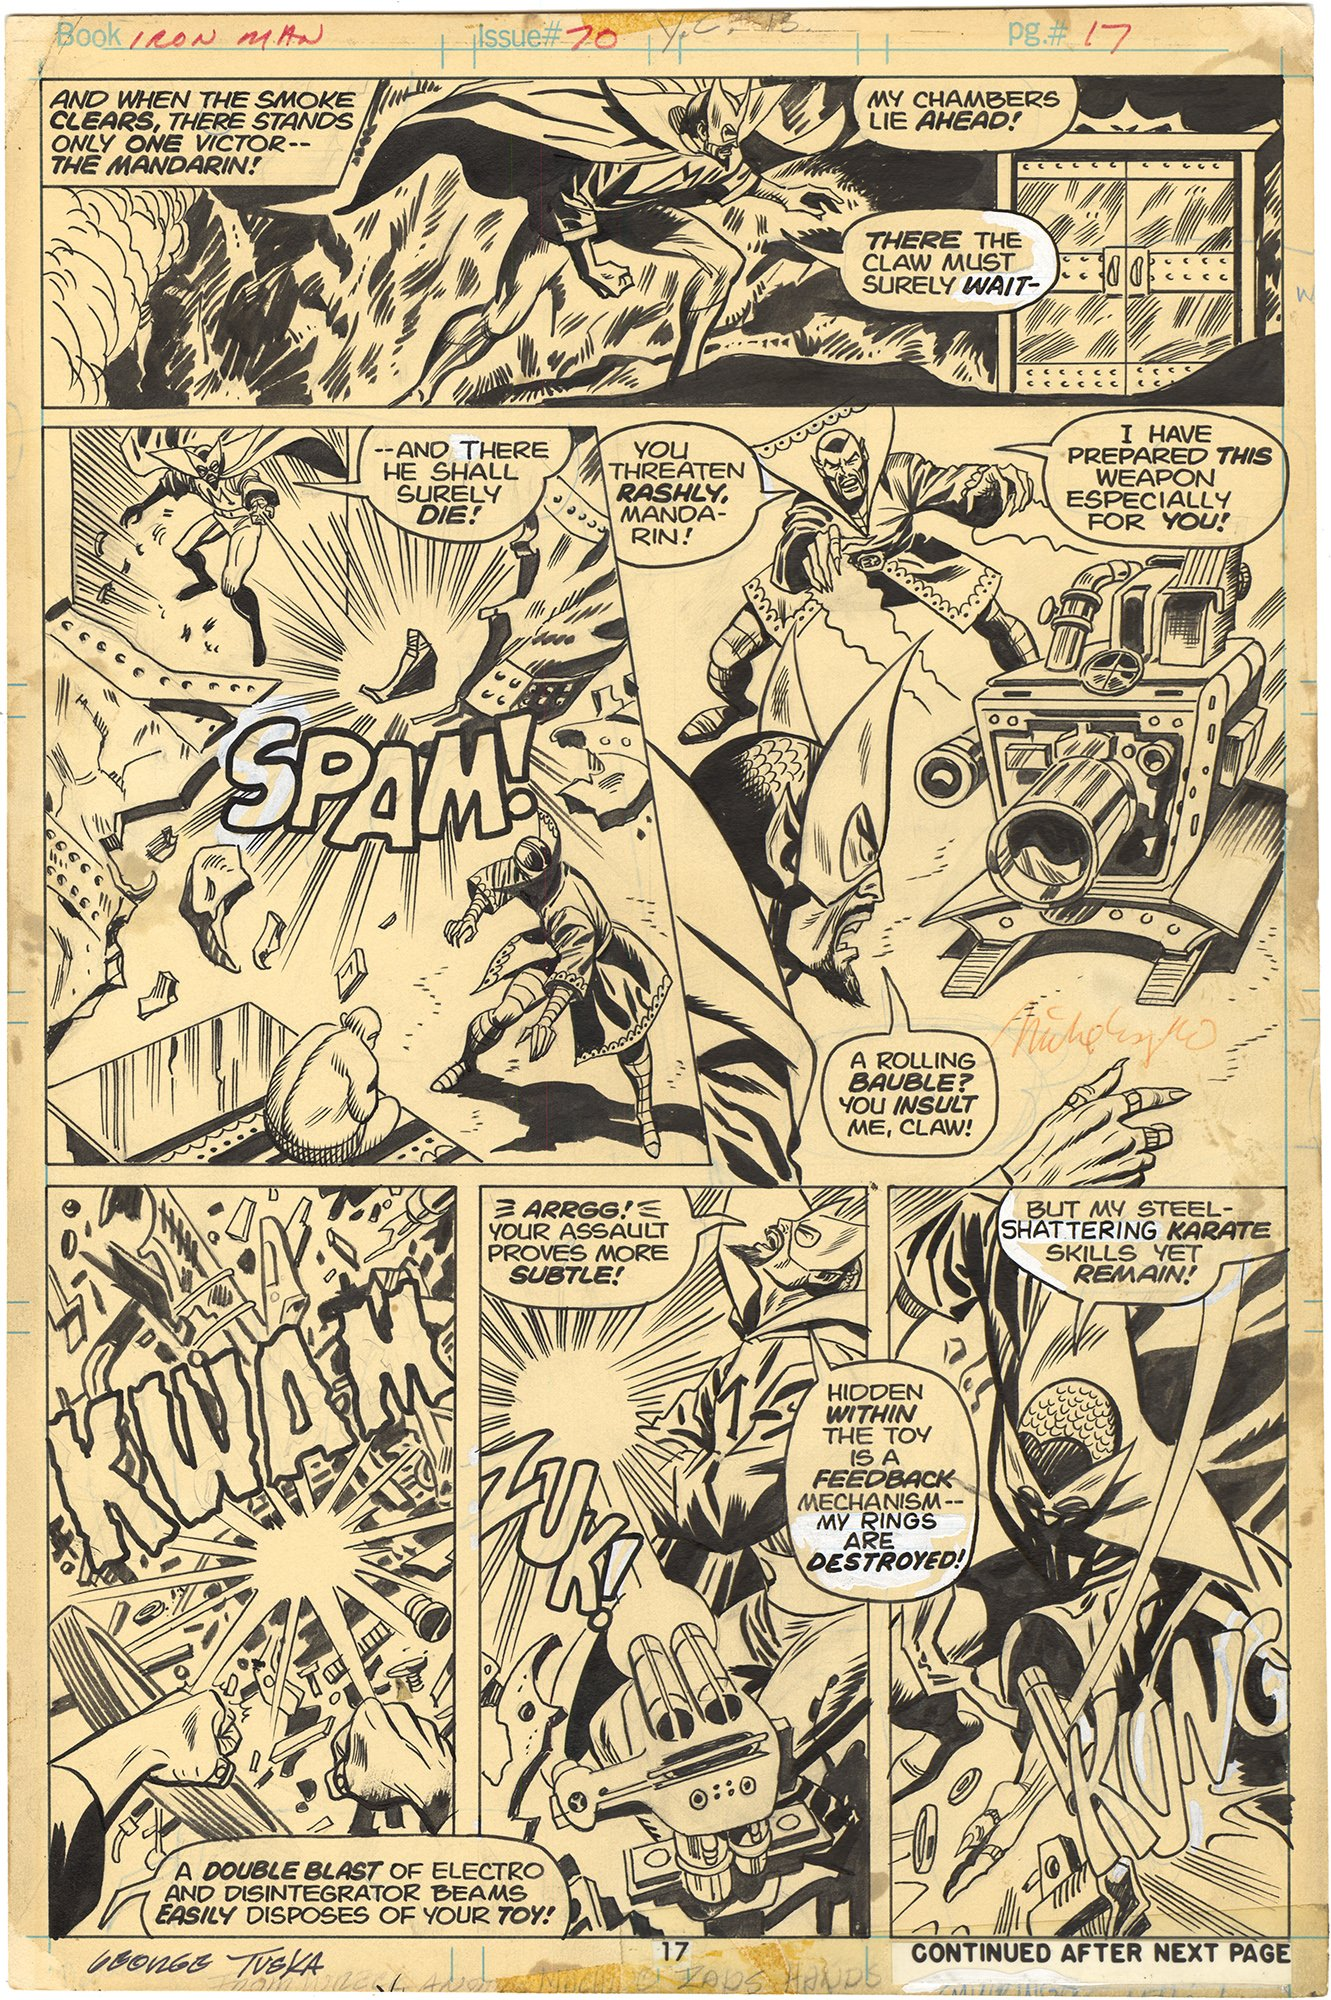 Iron Man #70 p17